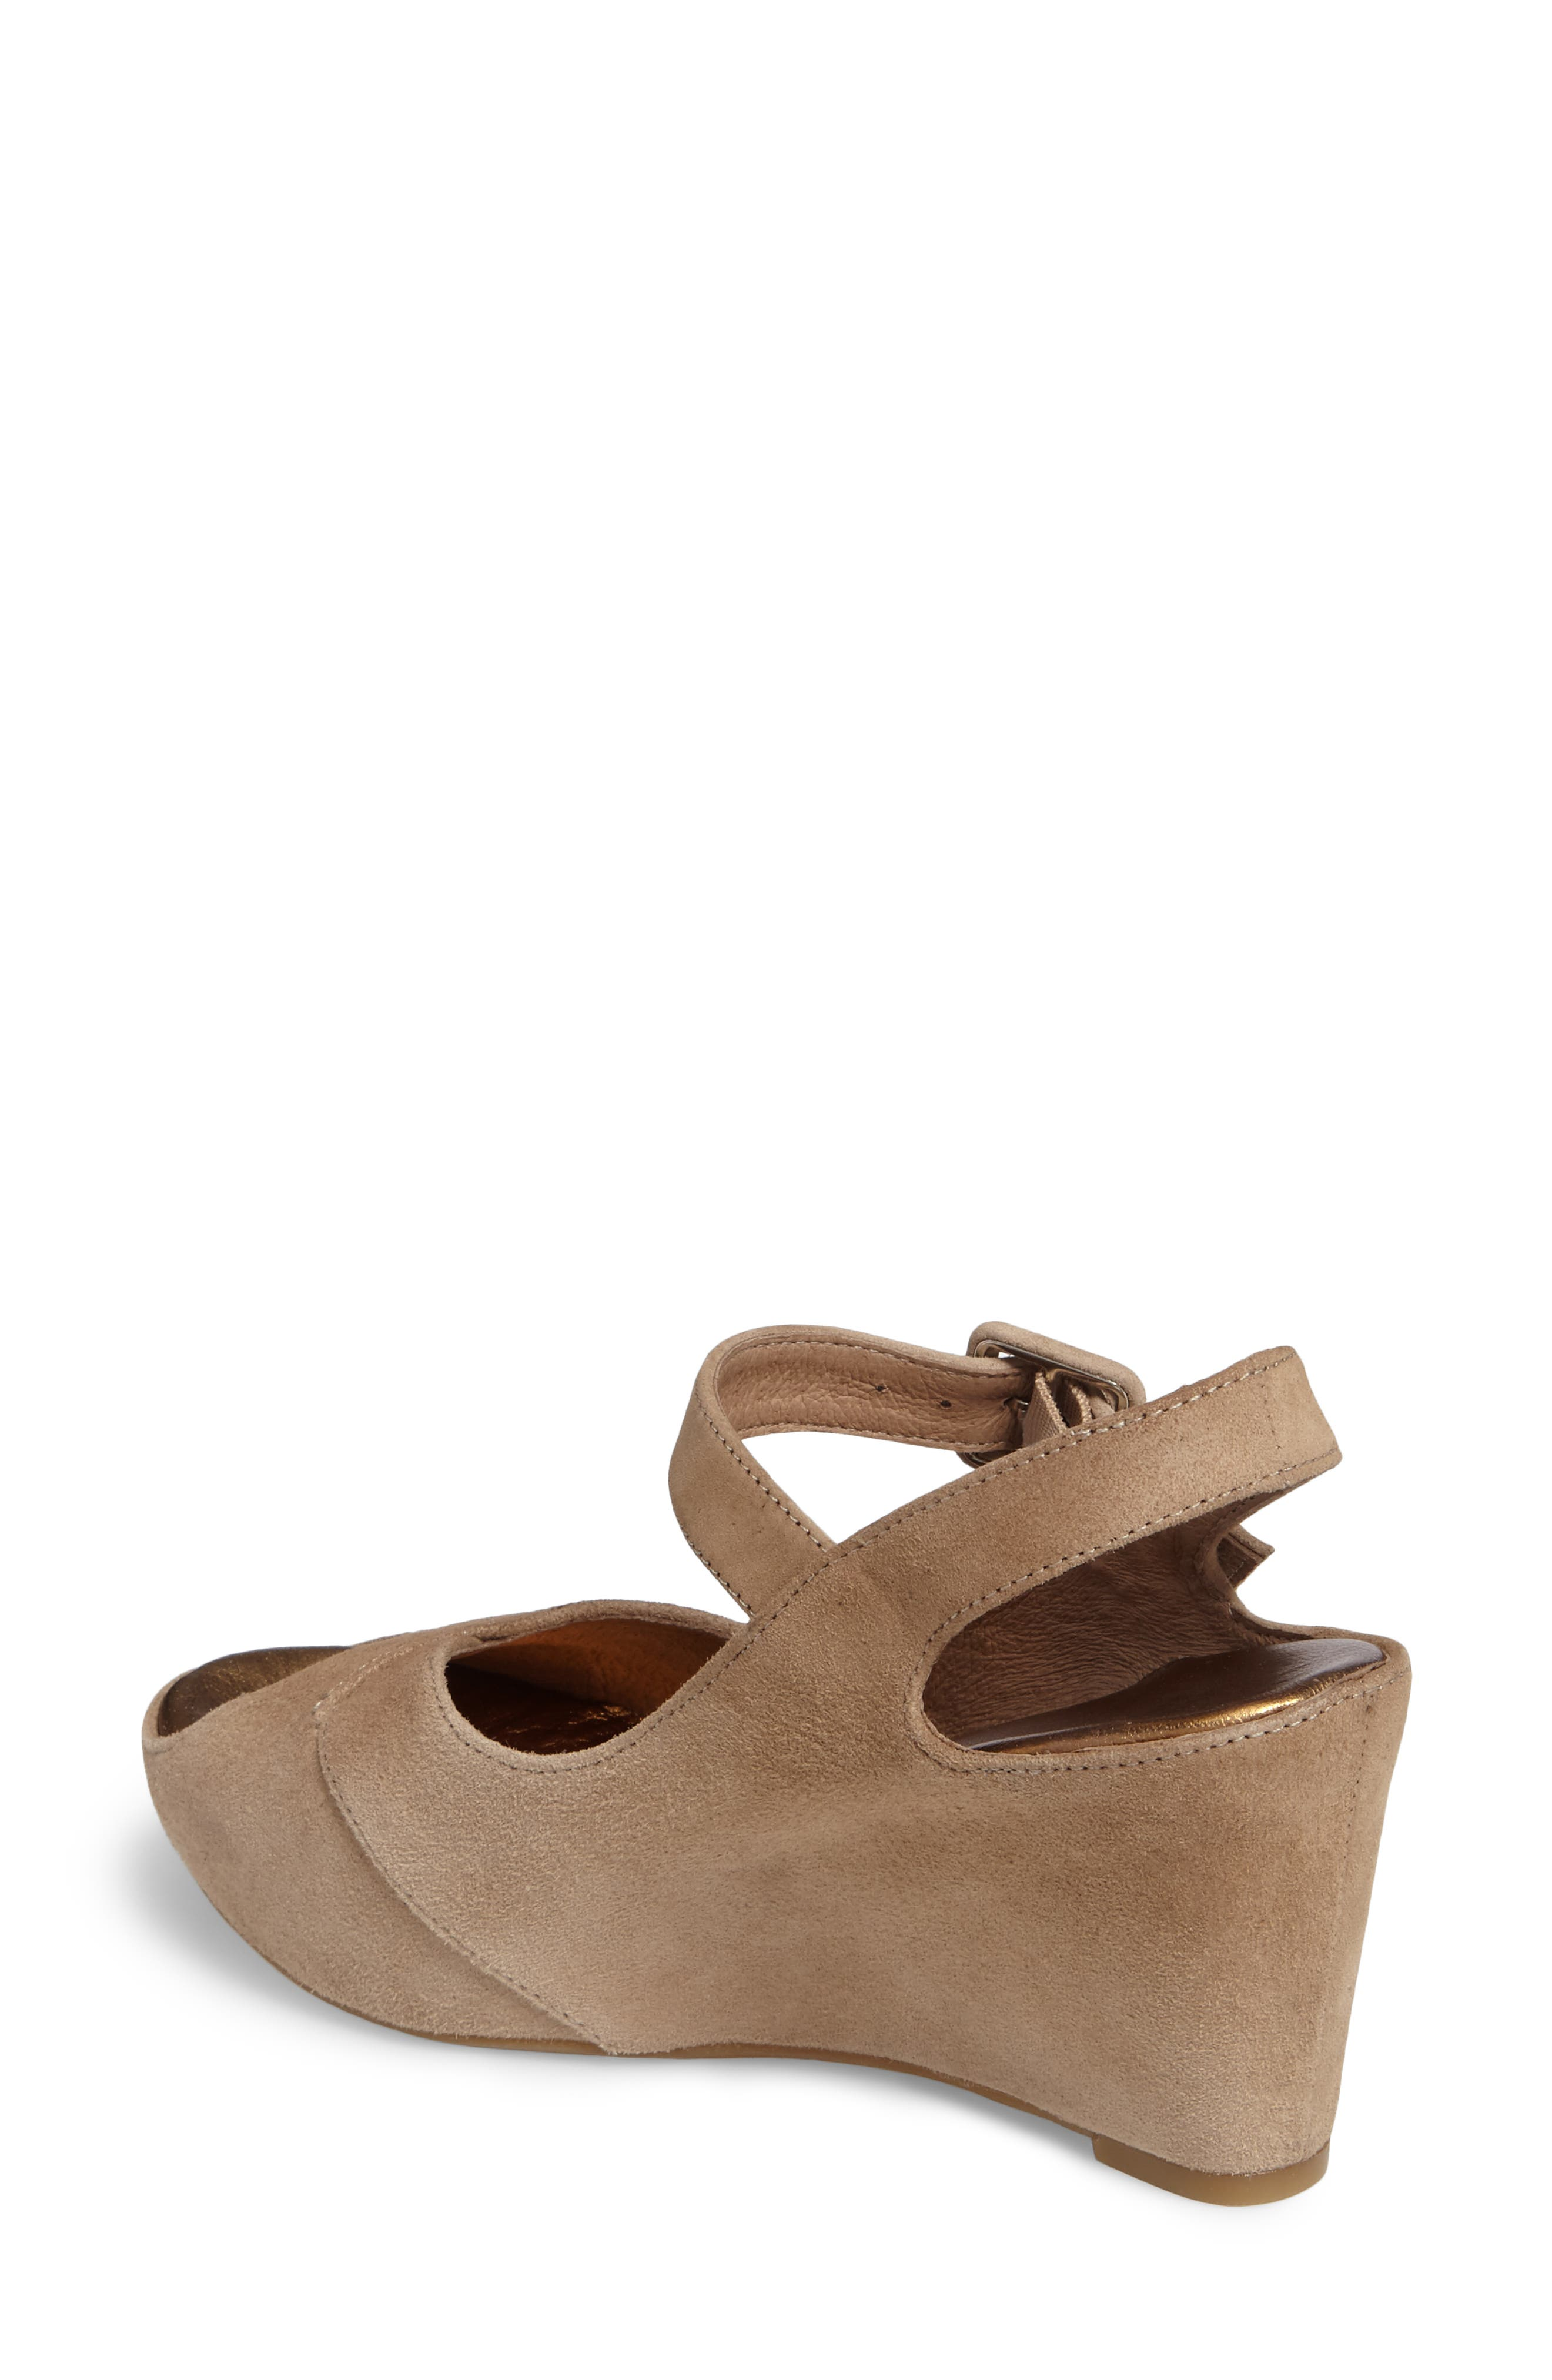 Tara Platform Wedge Sandal,                             Alternate thumbnail 2, color,                             Taupe Suede